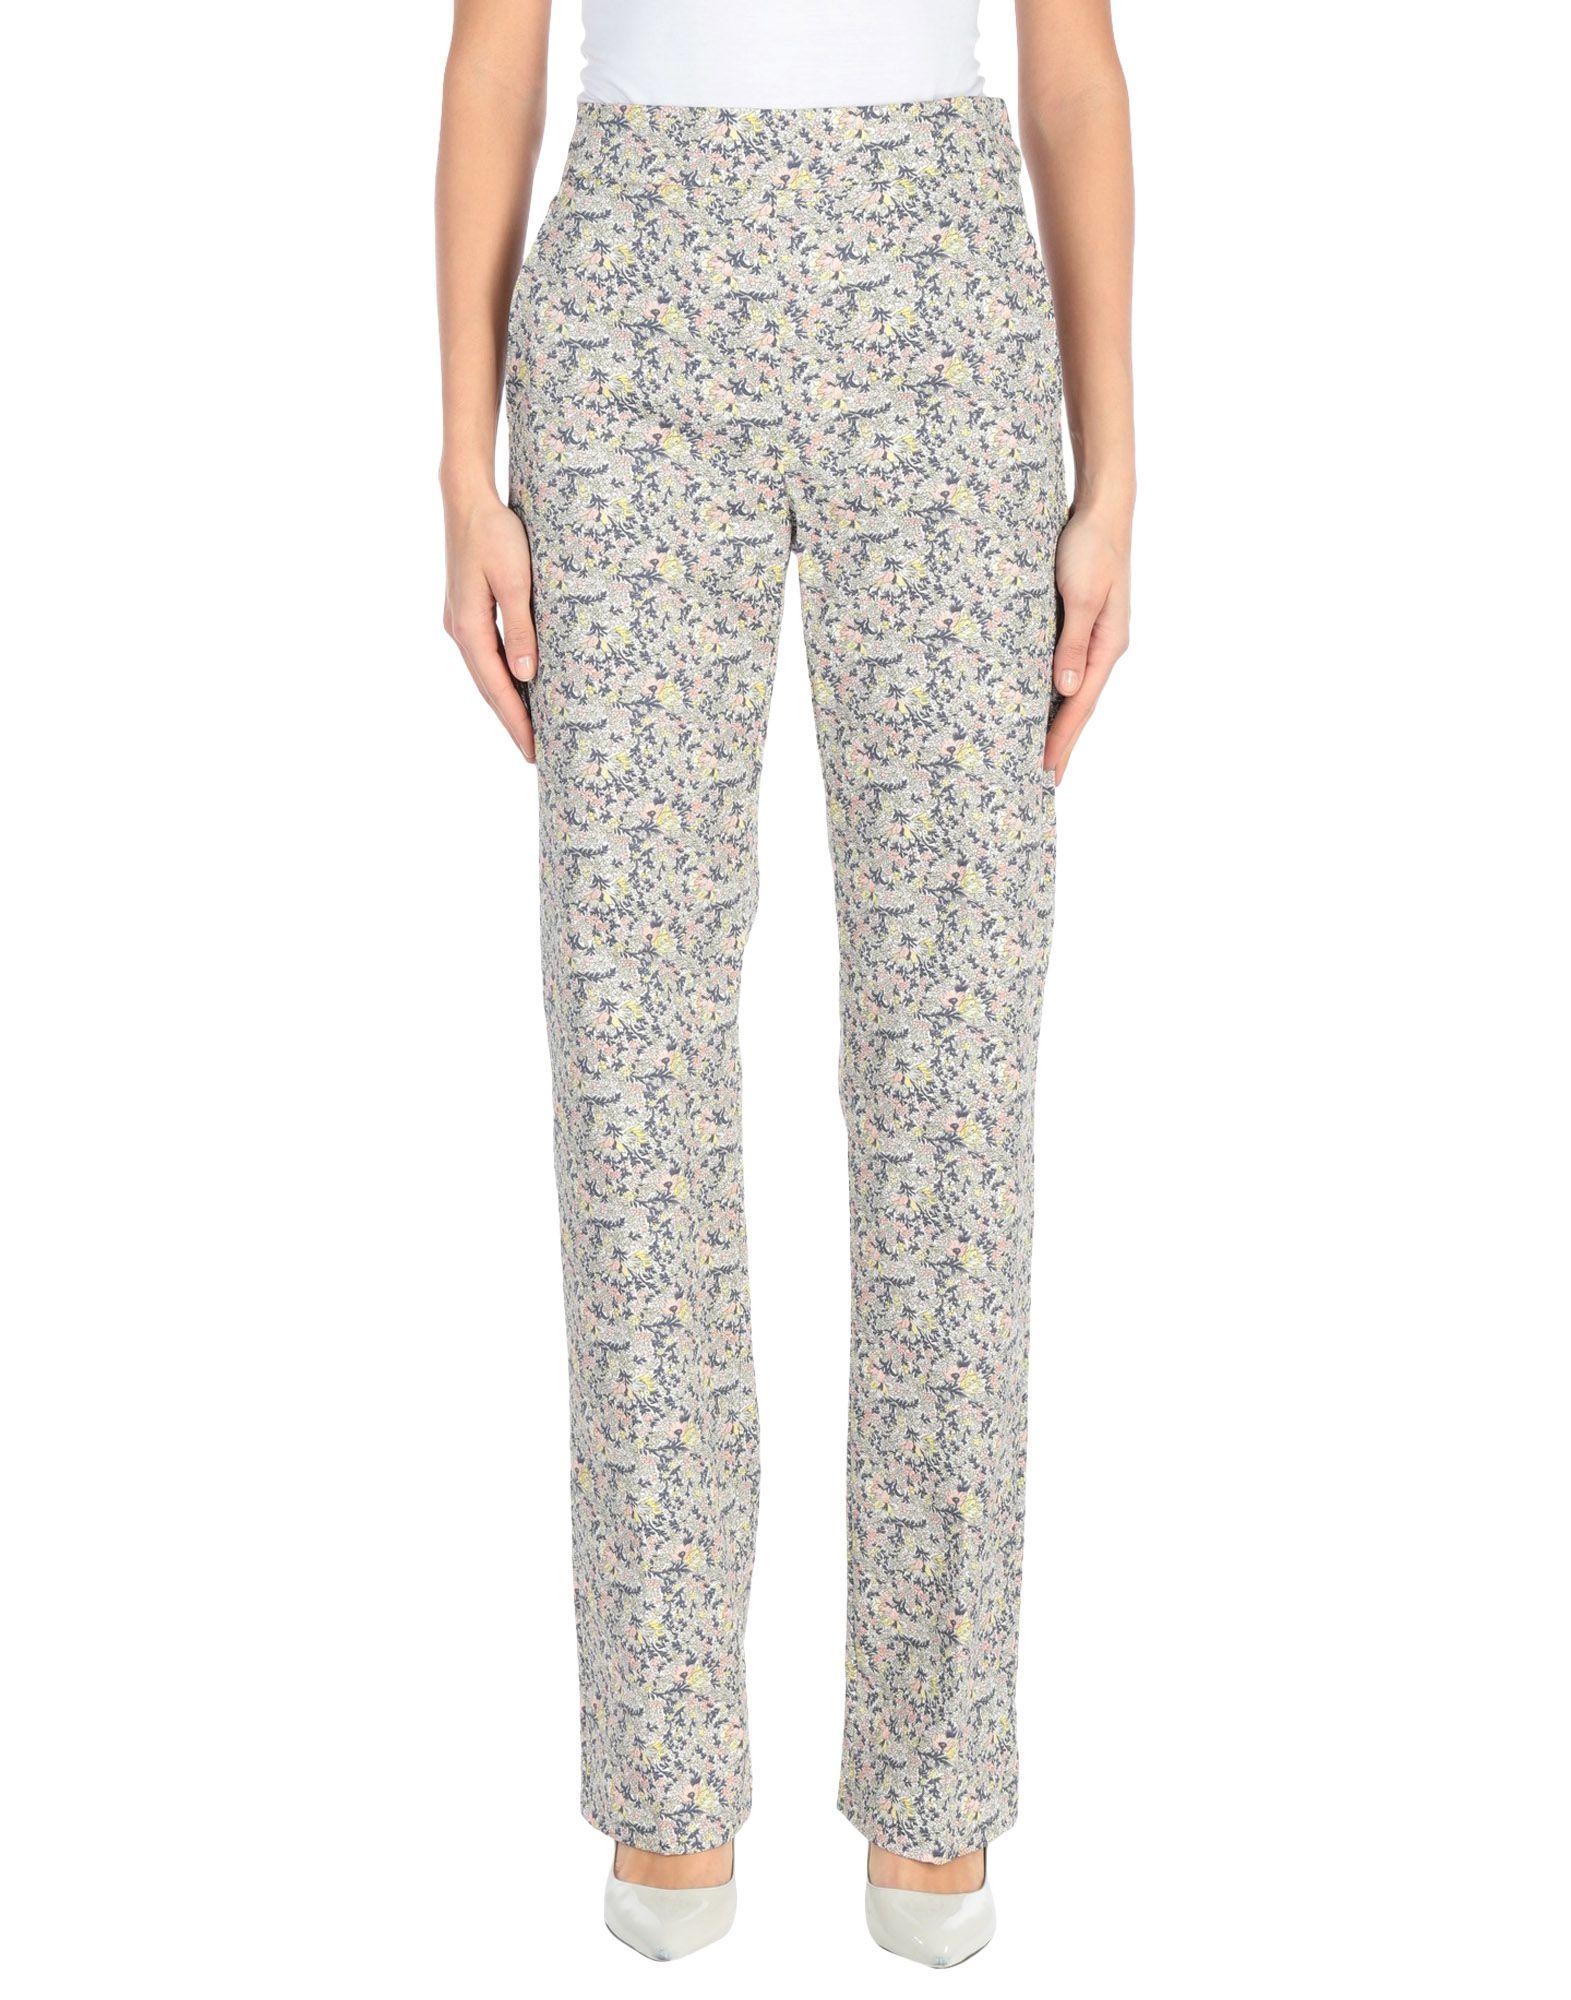 Pantalone Max & Co. Co. donna - 13301281IT